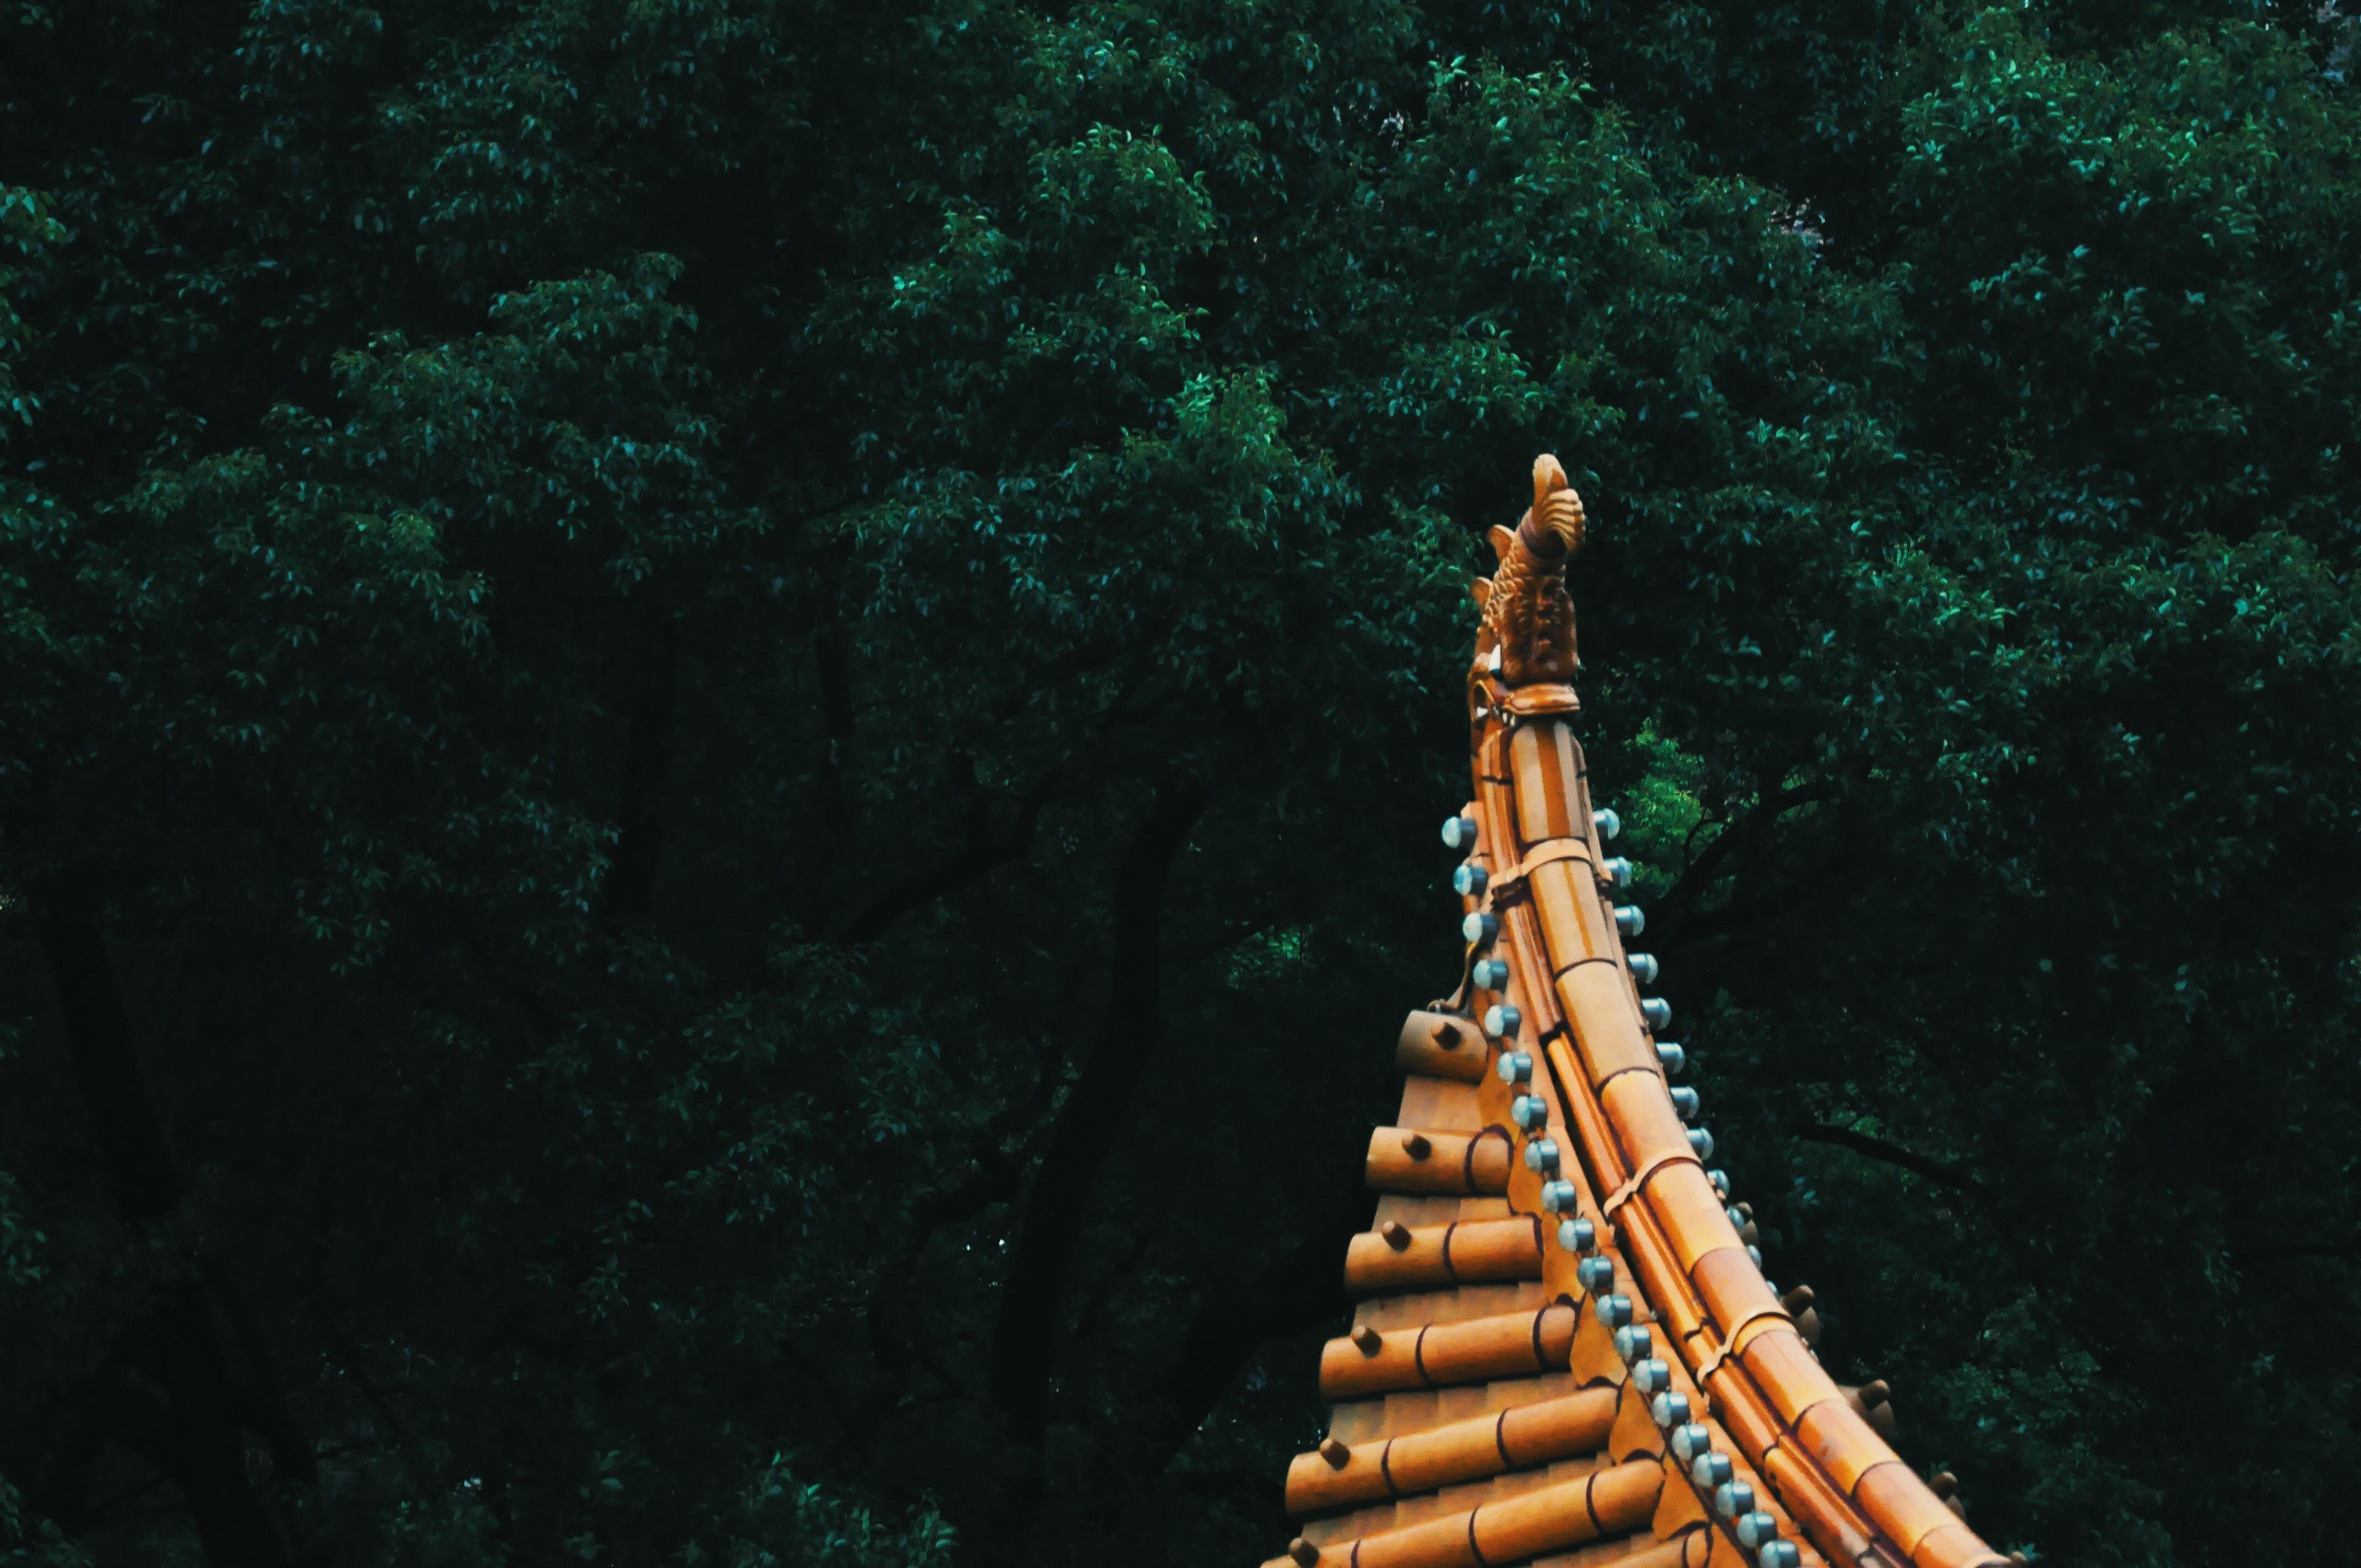 orange temple roof near trees